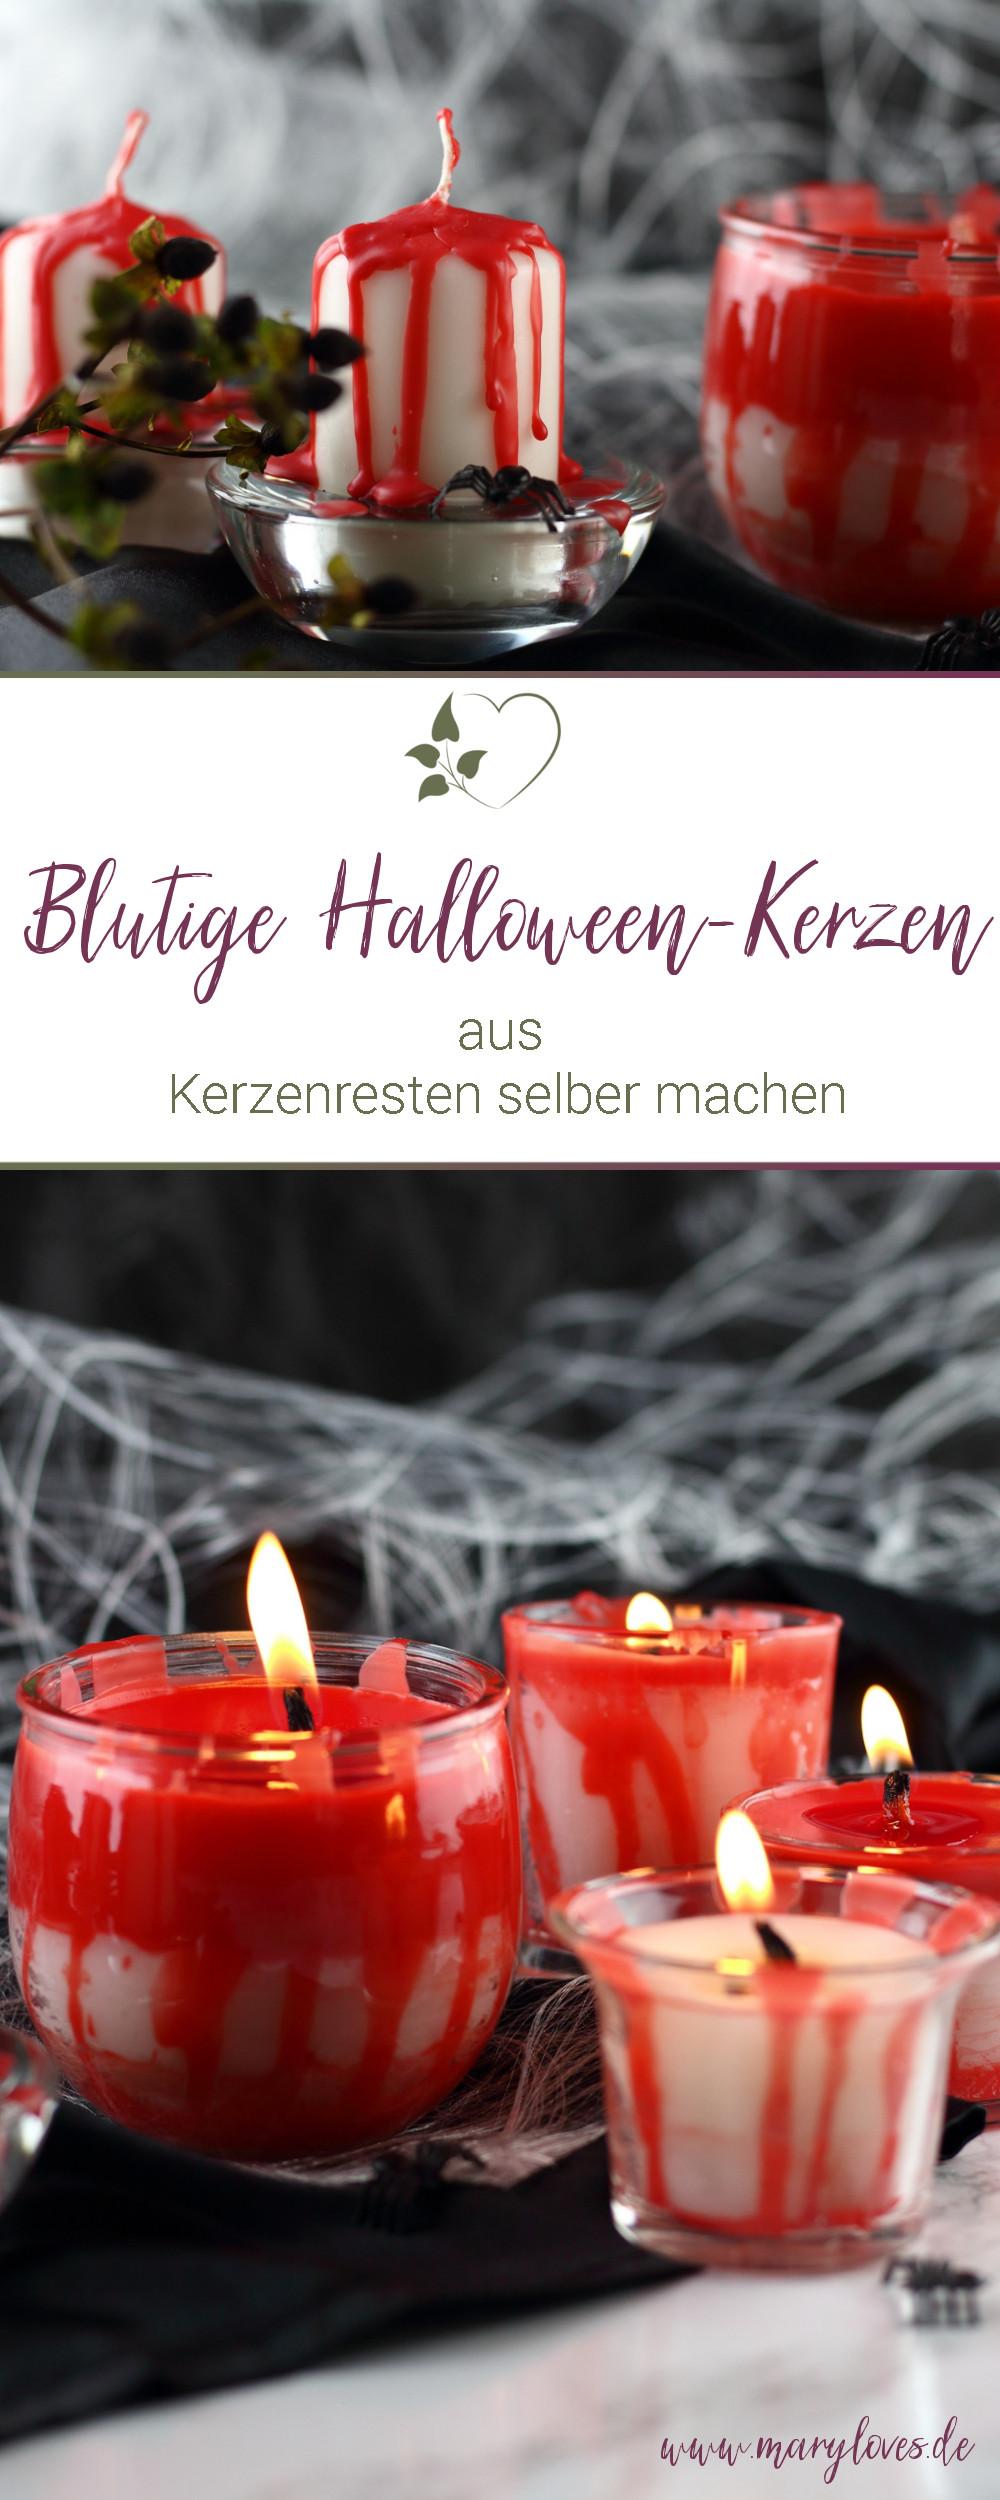 Blutige Halloween-Kerzen aus Kerzenresten selber machen - #halloween #halloweendeko #halloweenkerzen #blutigekerzen #kerzen #diykerzen #kerzenreste